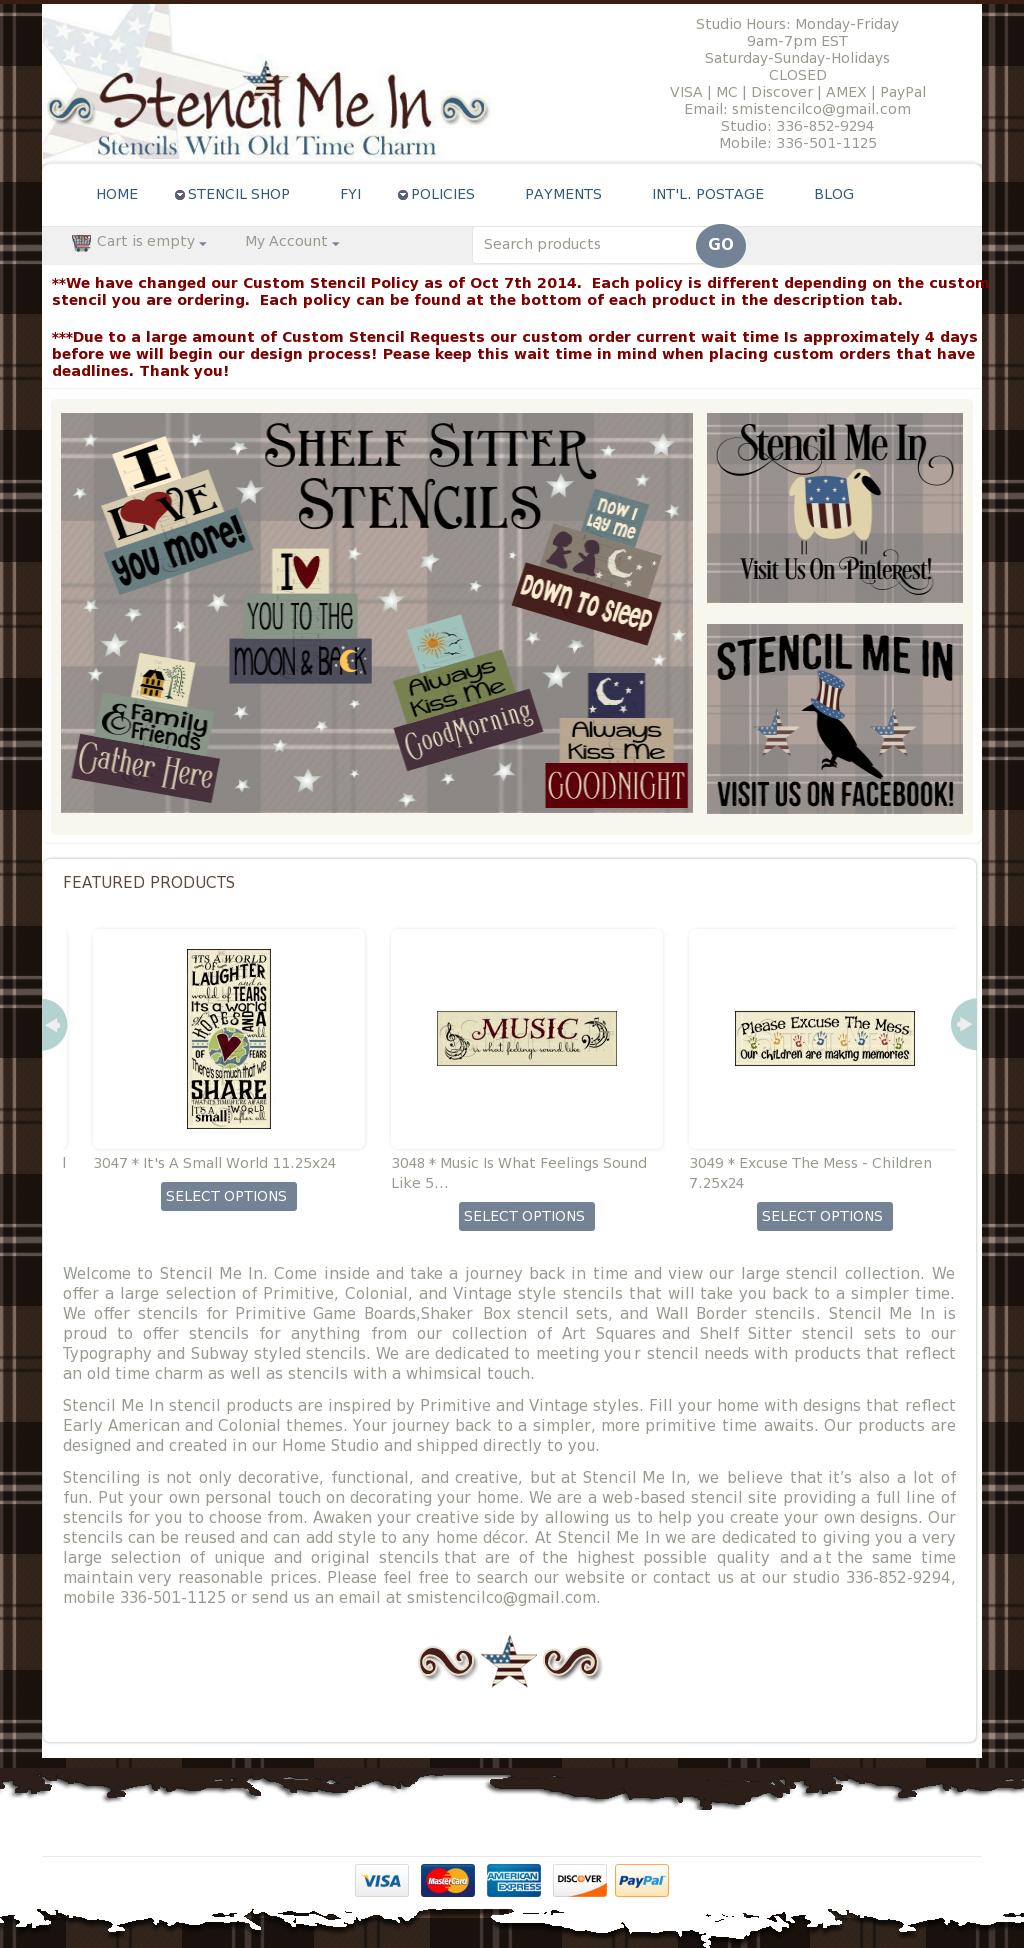 Stencil Me In Competitors, Revenue and Employees - Owler Company Profile